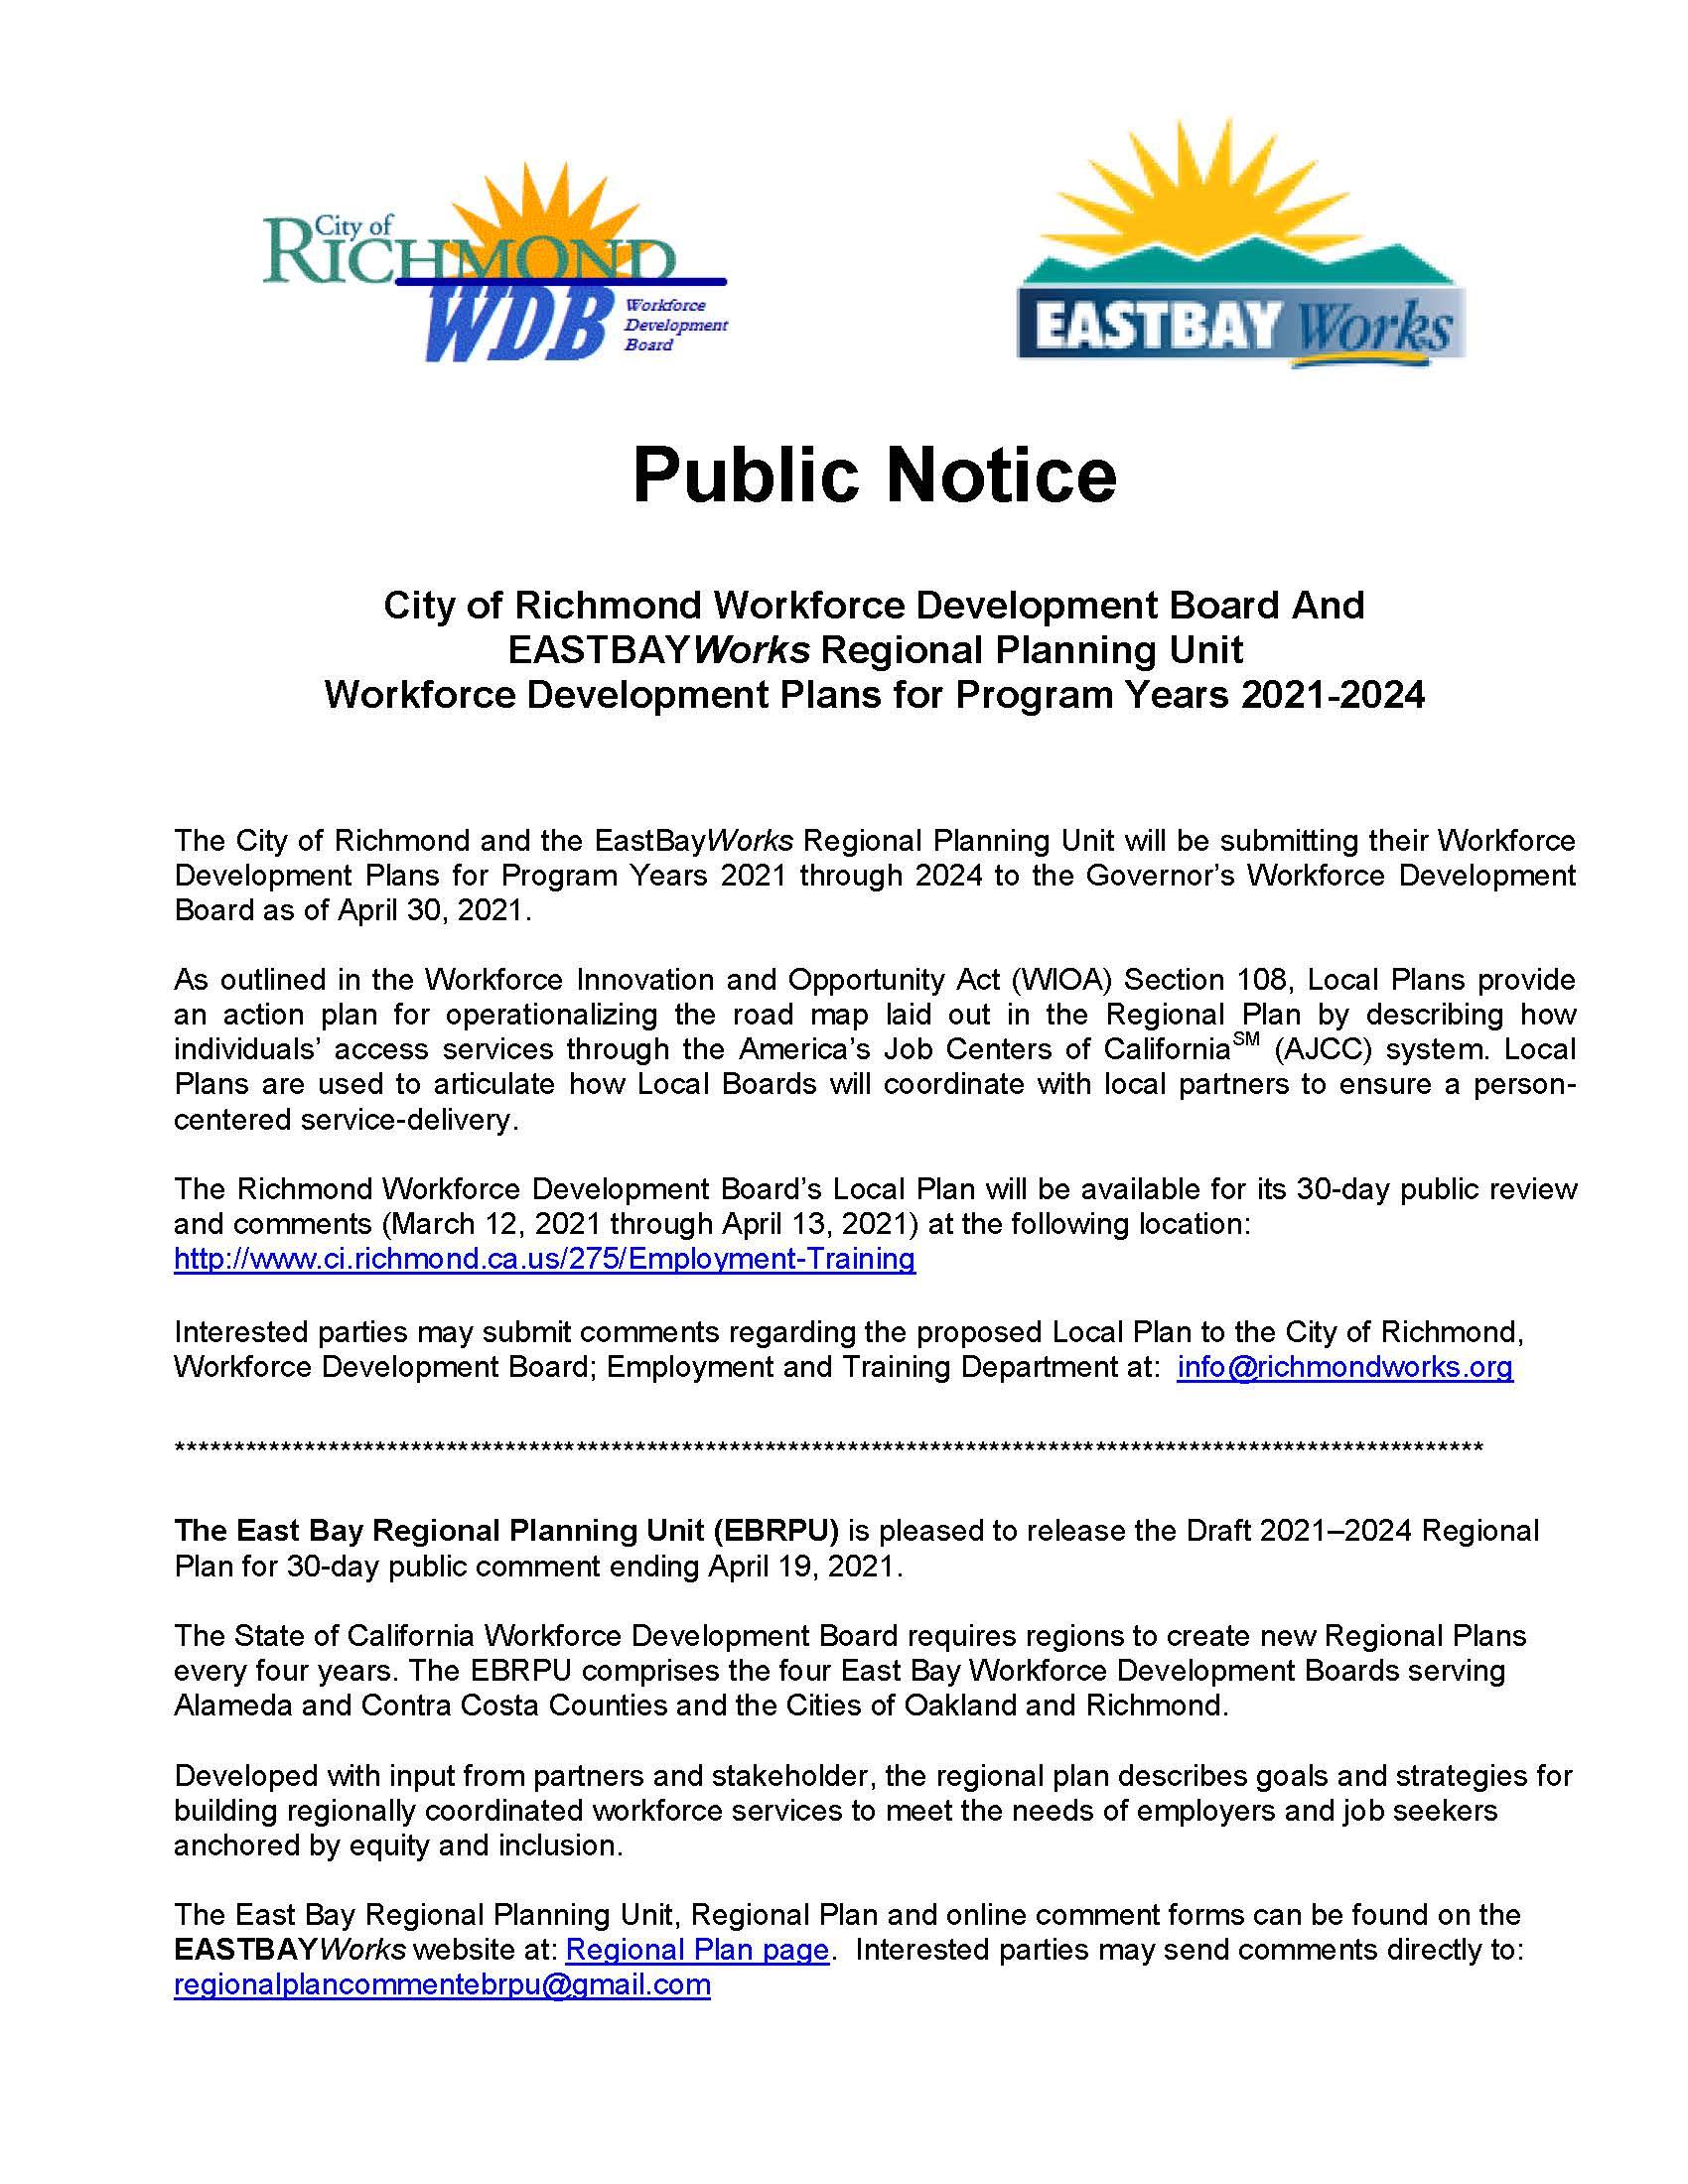 Public Notice.Regional and Local Plan 03-2021